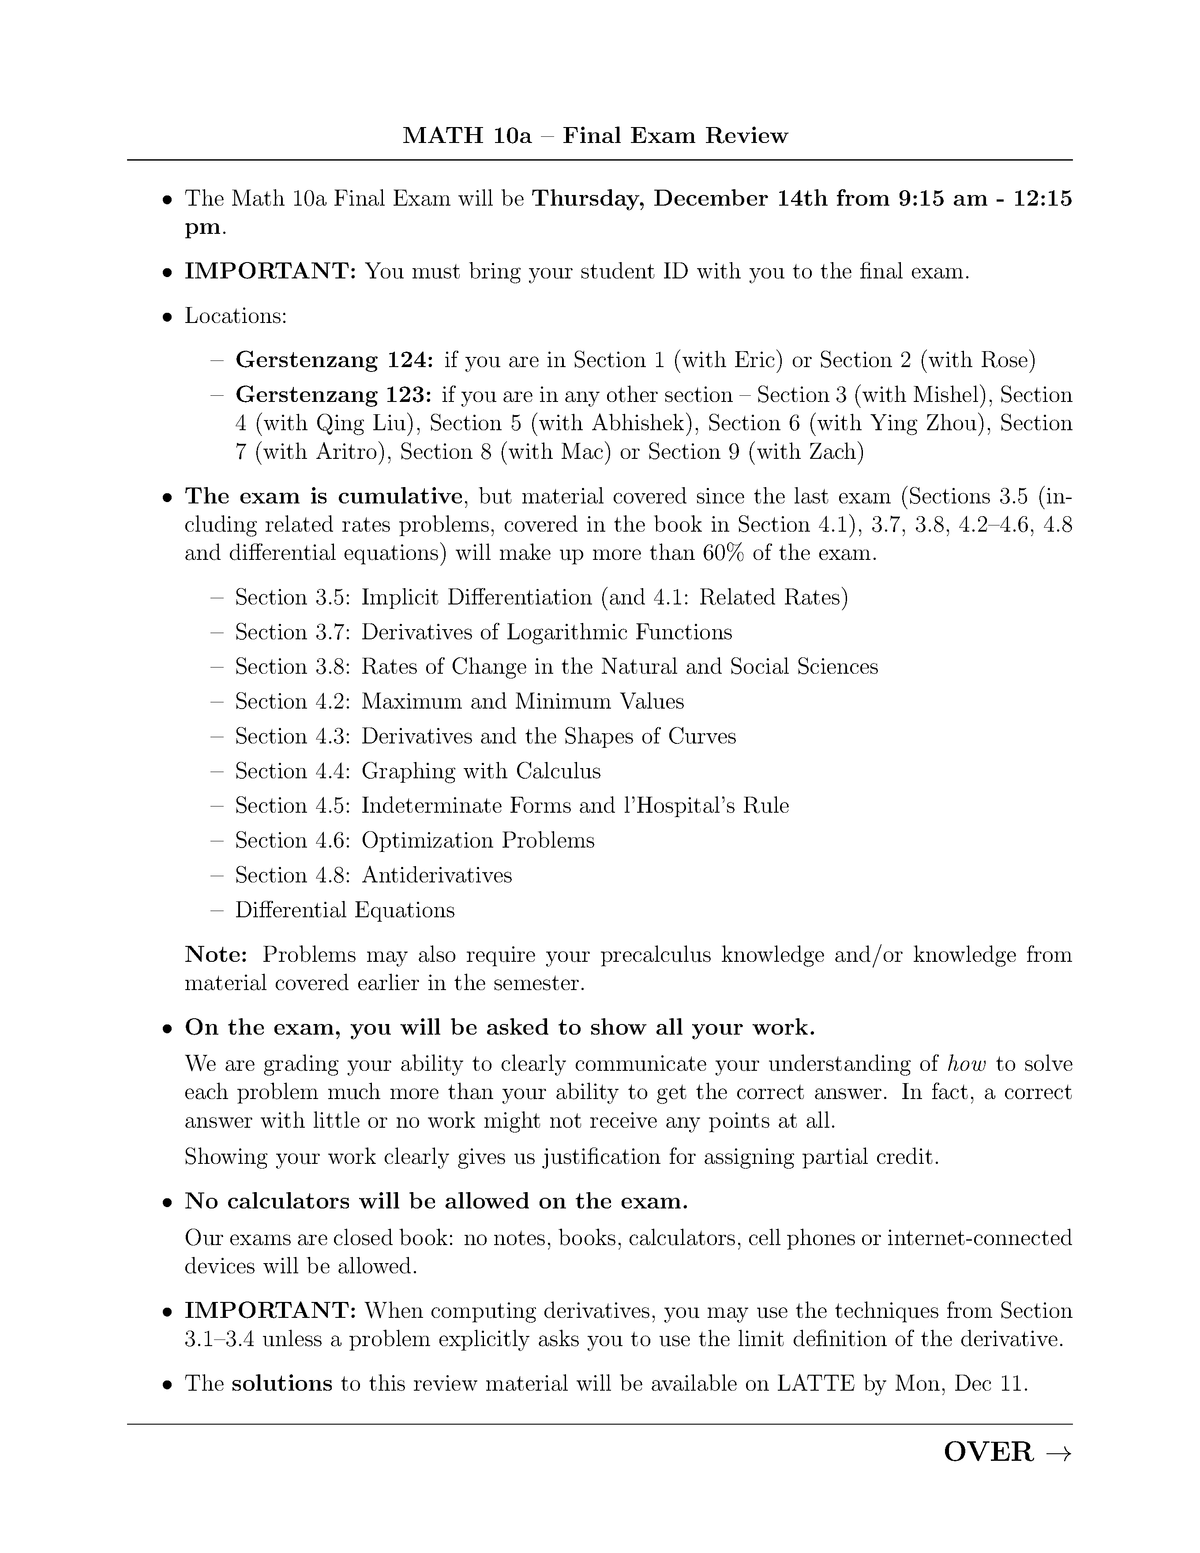 Exam 2017 - MATH 10A: Techniques Of Calculus (A) - StuDocu